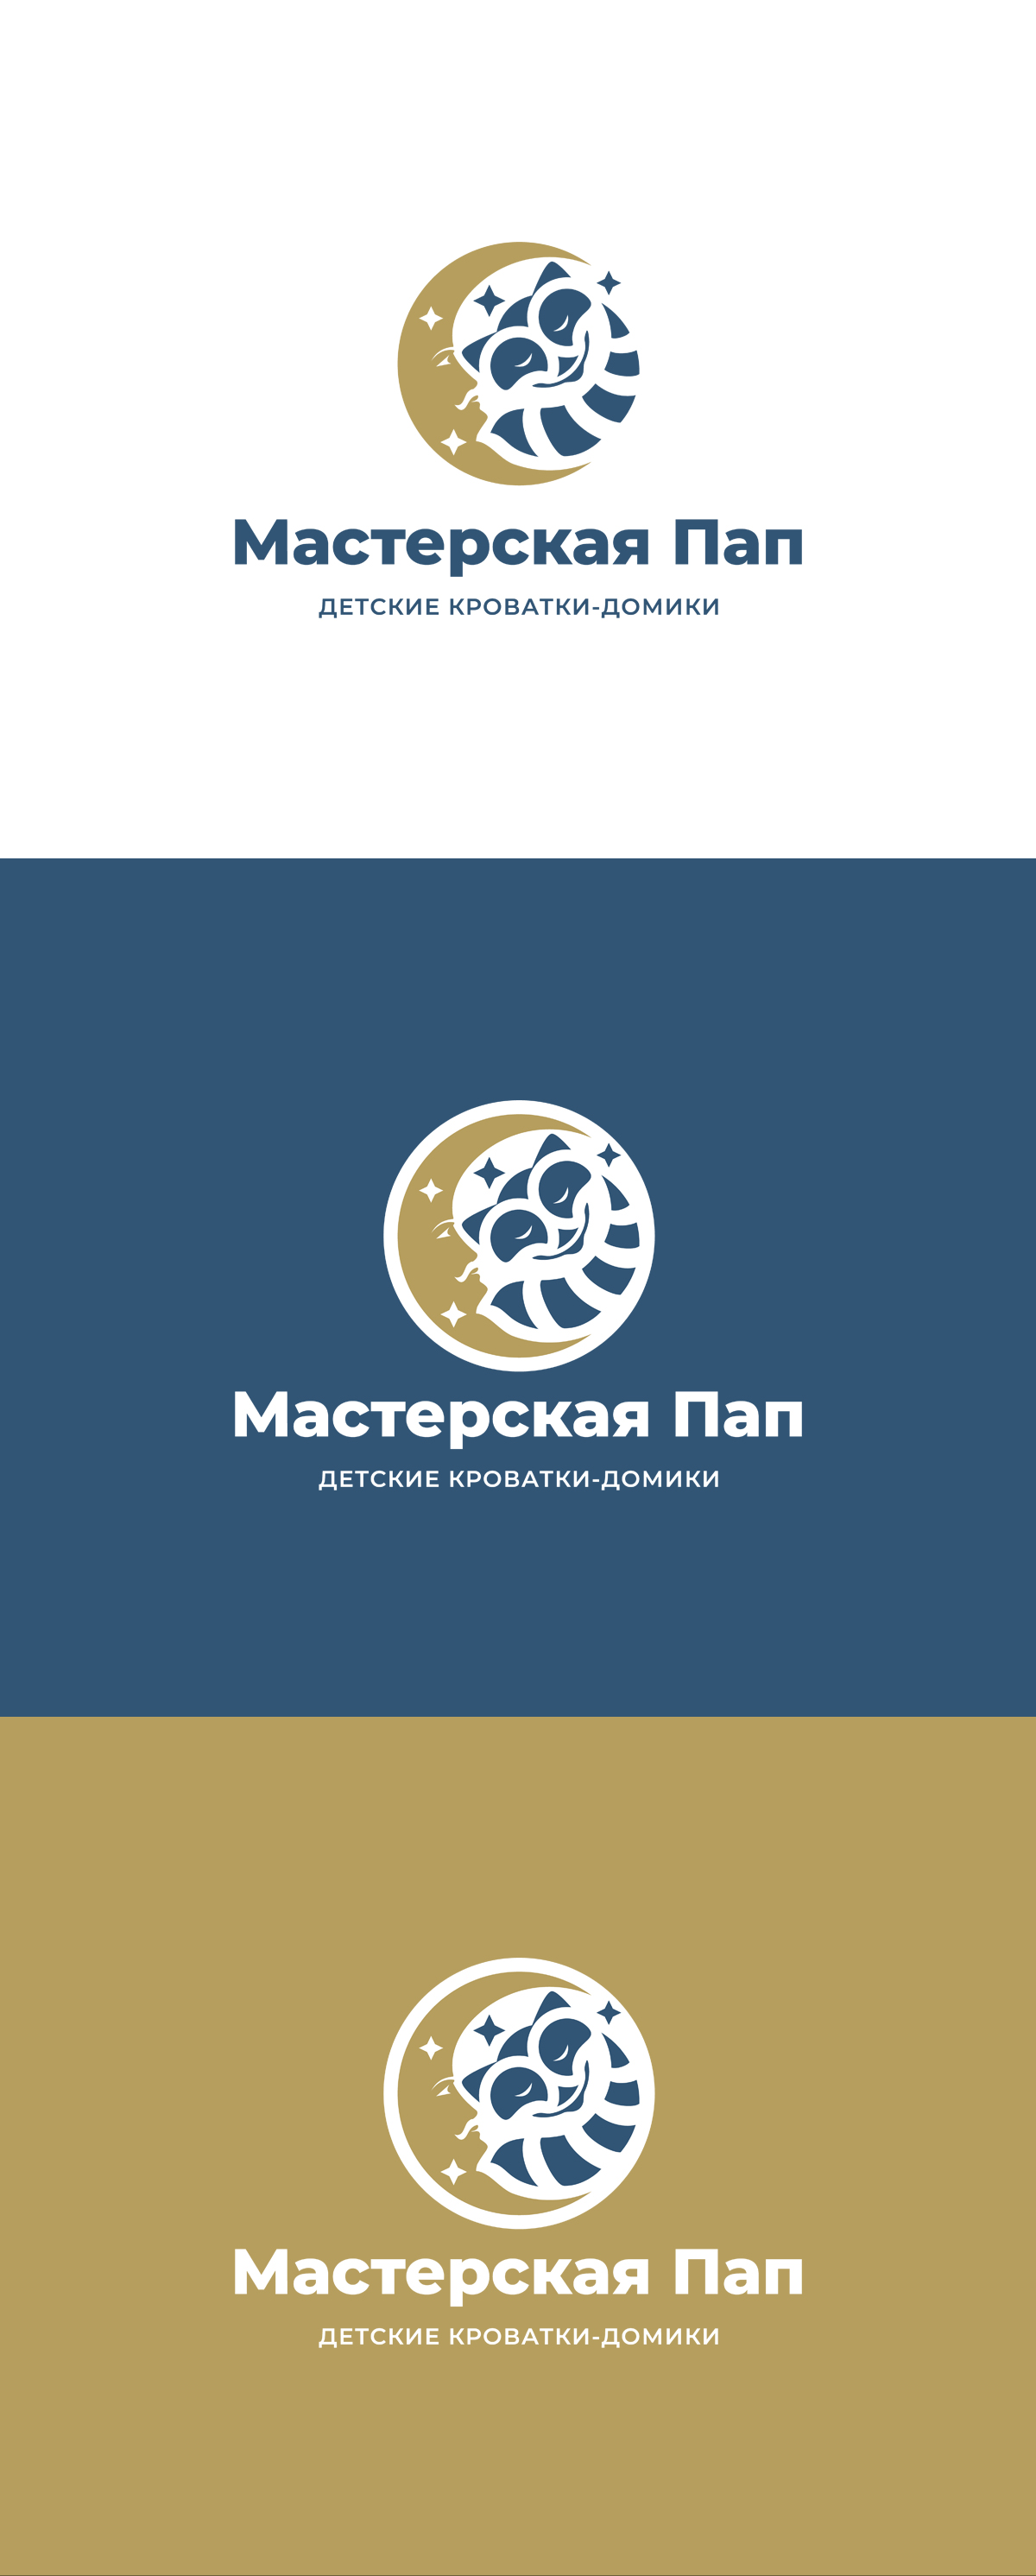 Разработка логотипа  фото f_0795aaa528c8aa72.jpg